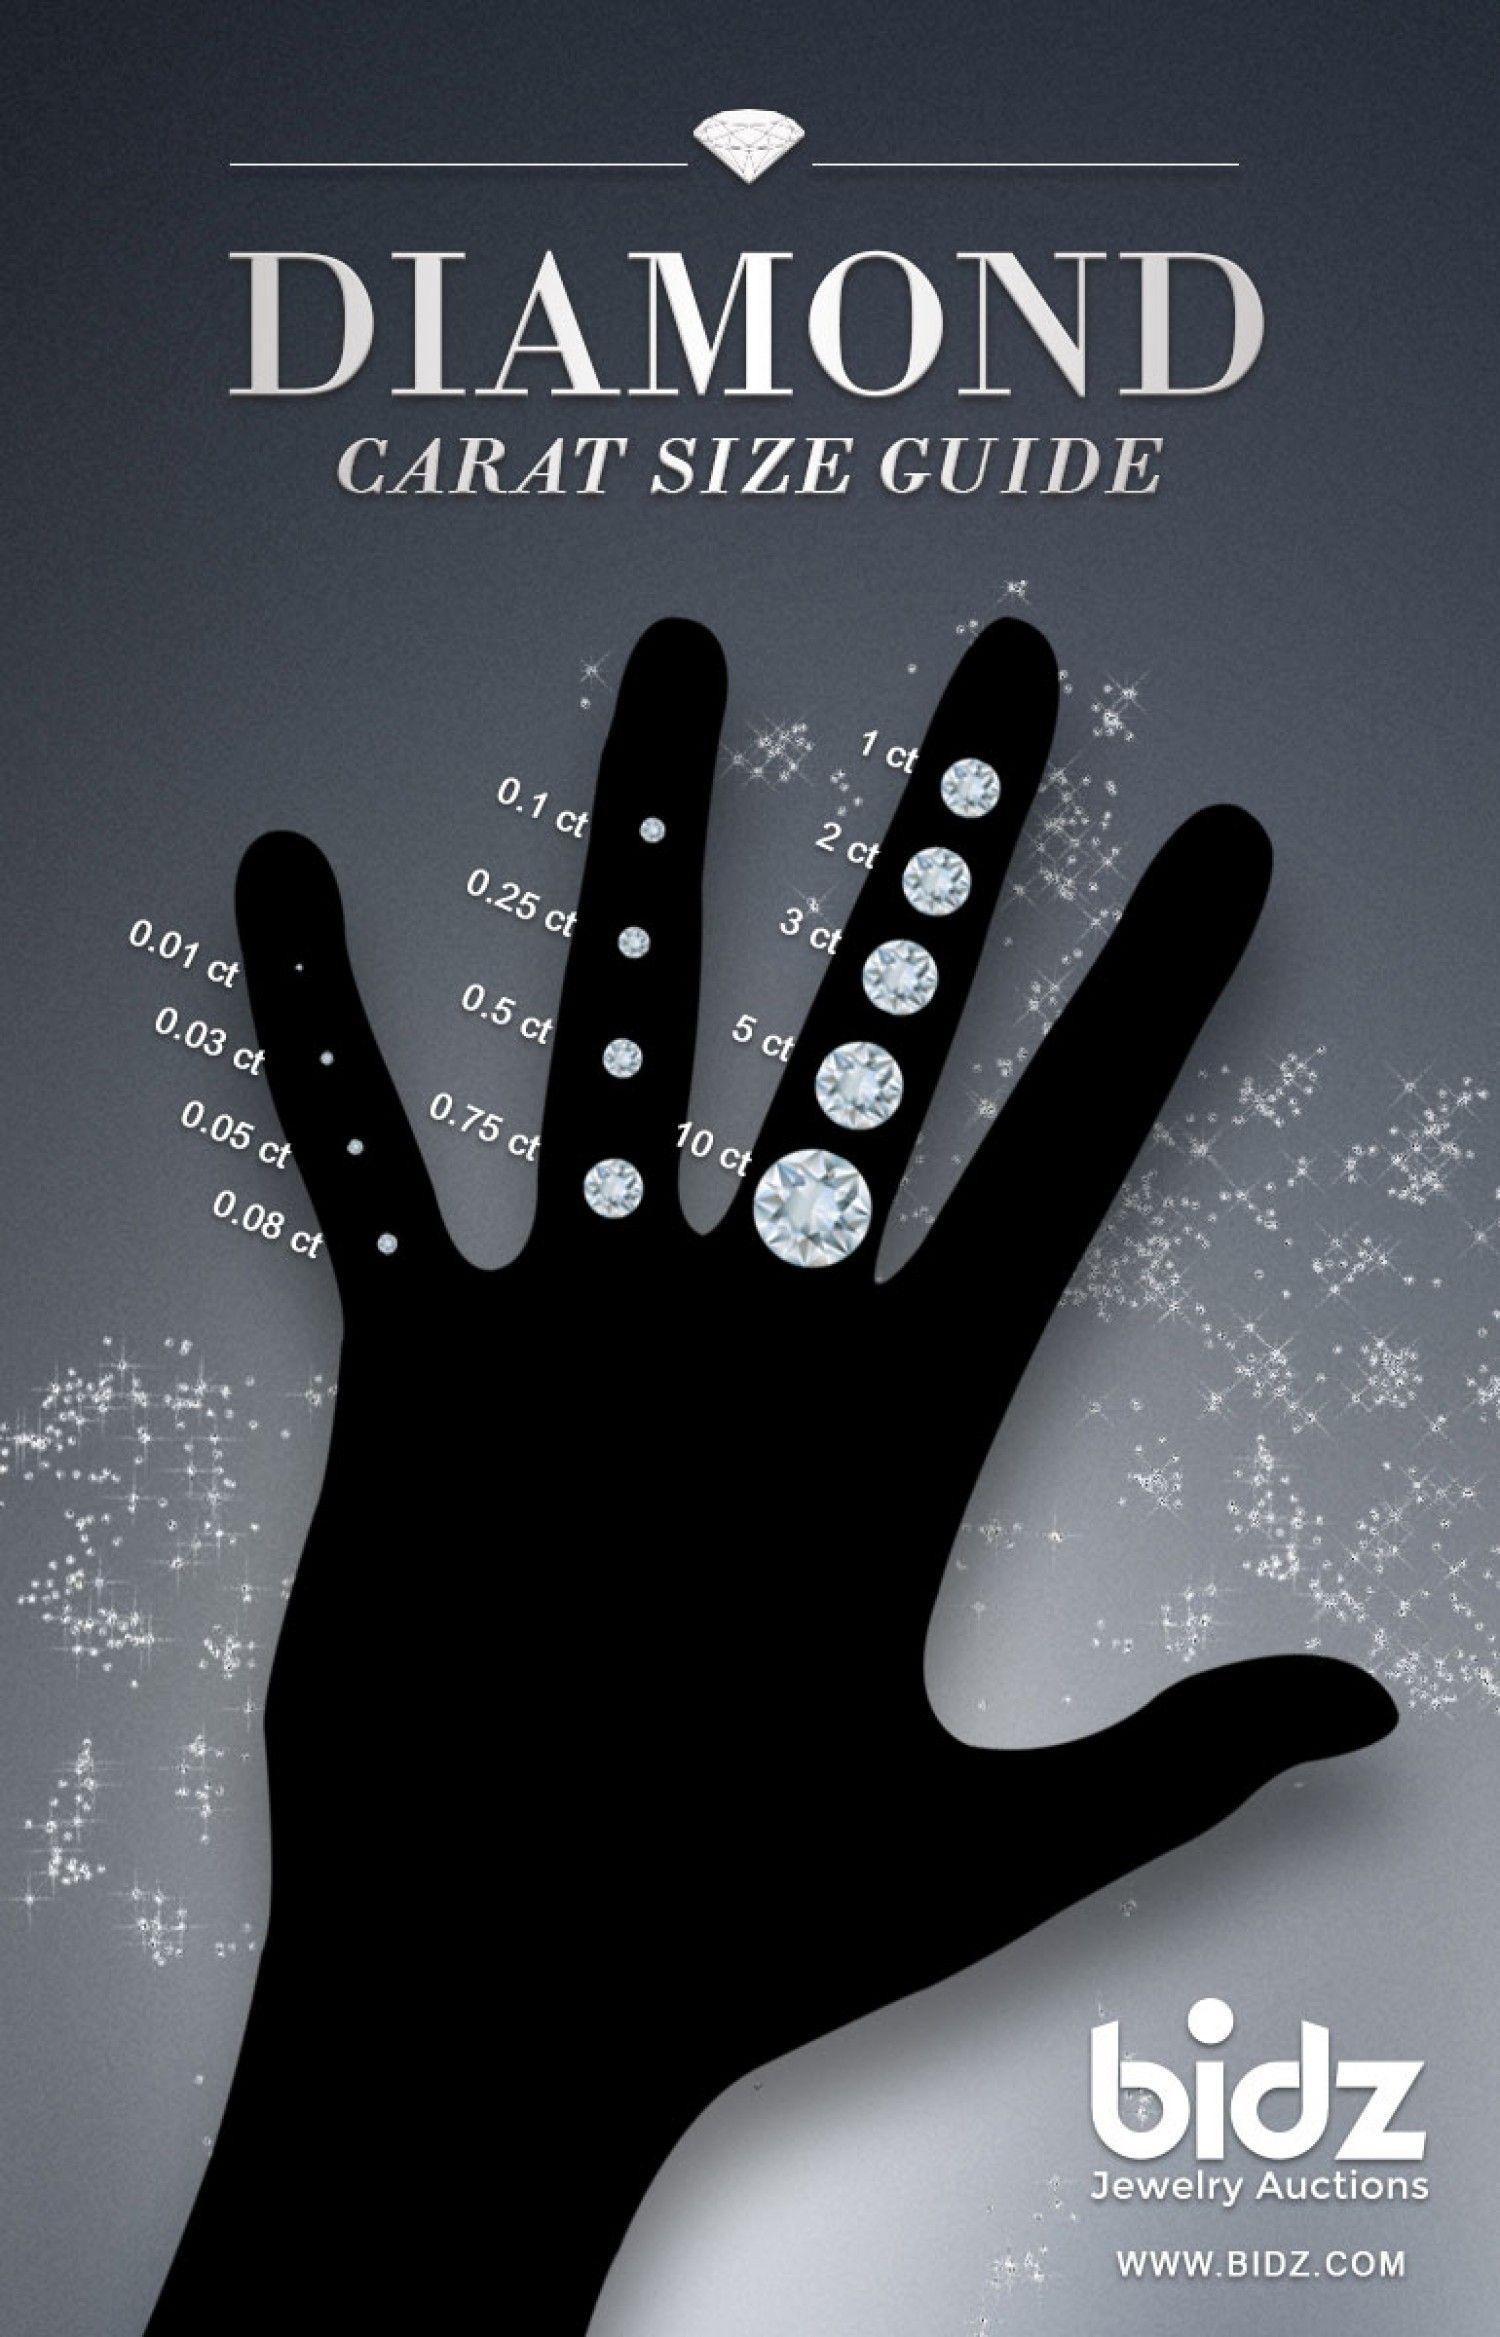 Diamond Carat Size Guide Infographic Good Websitez